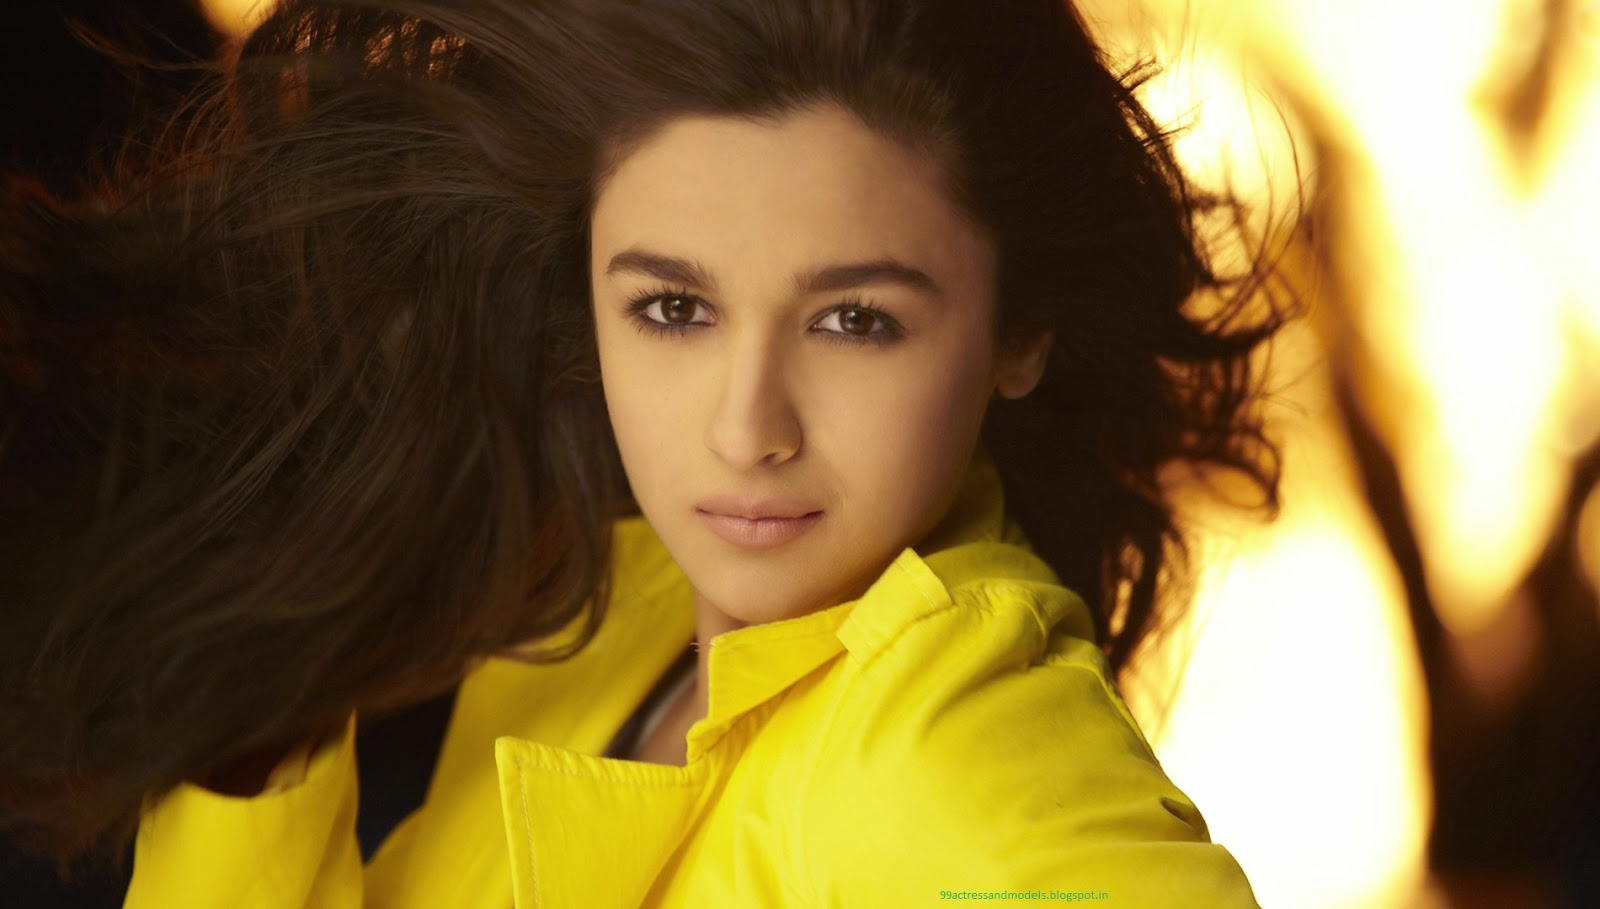 99 Actress And Models Alia Bhatt Bollywood Sexy Actress -1456